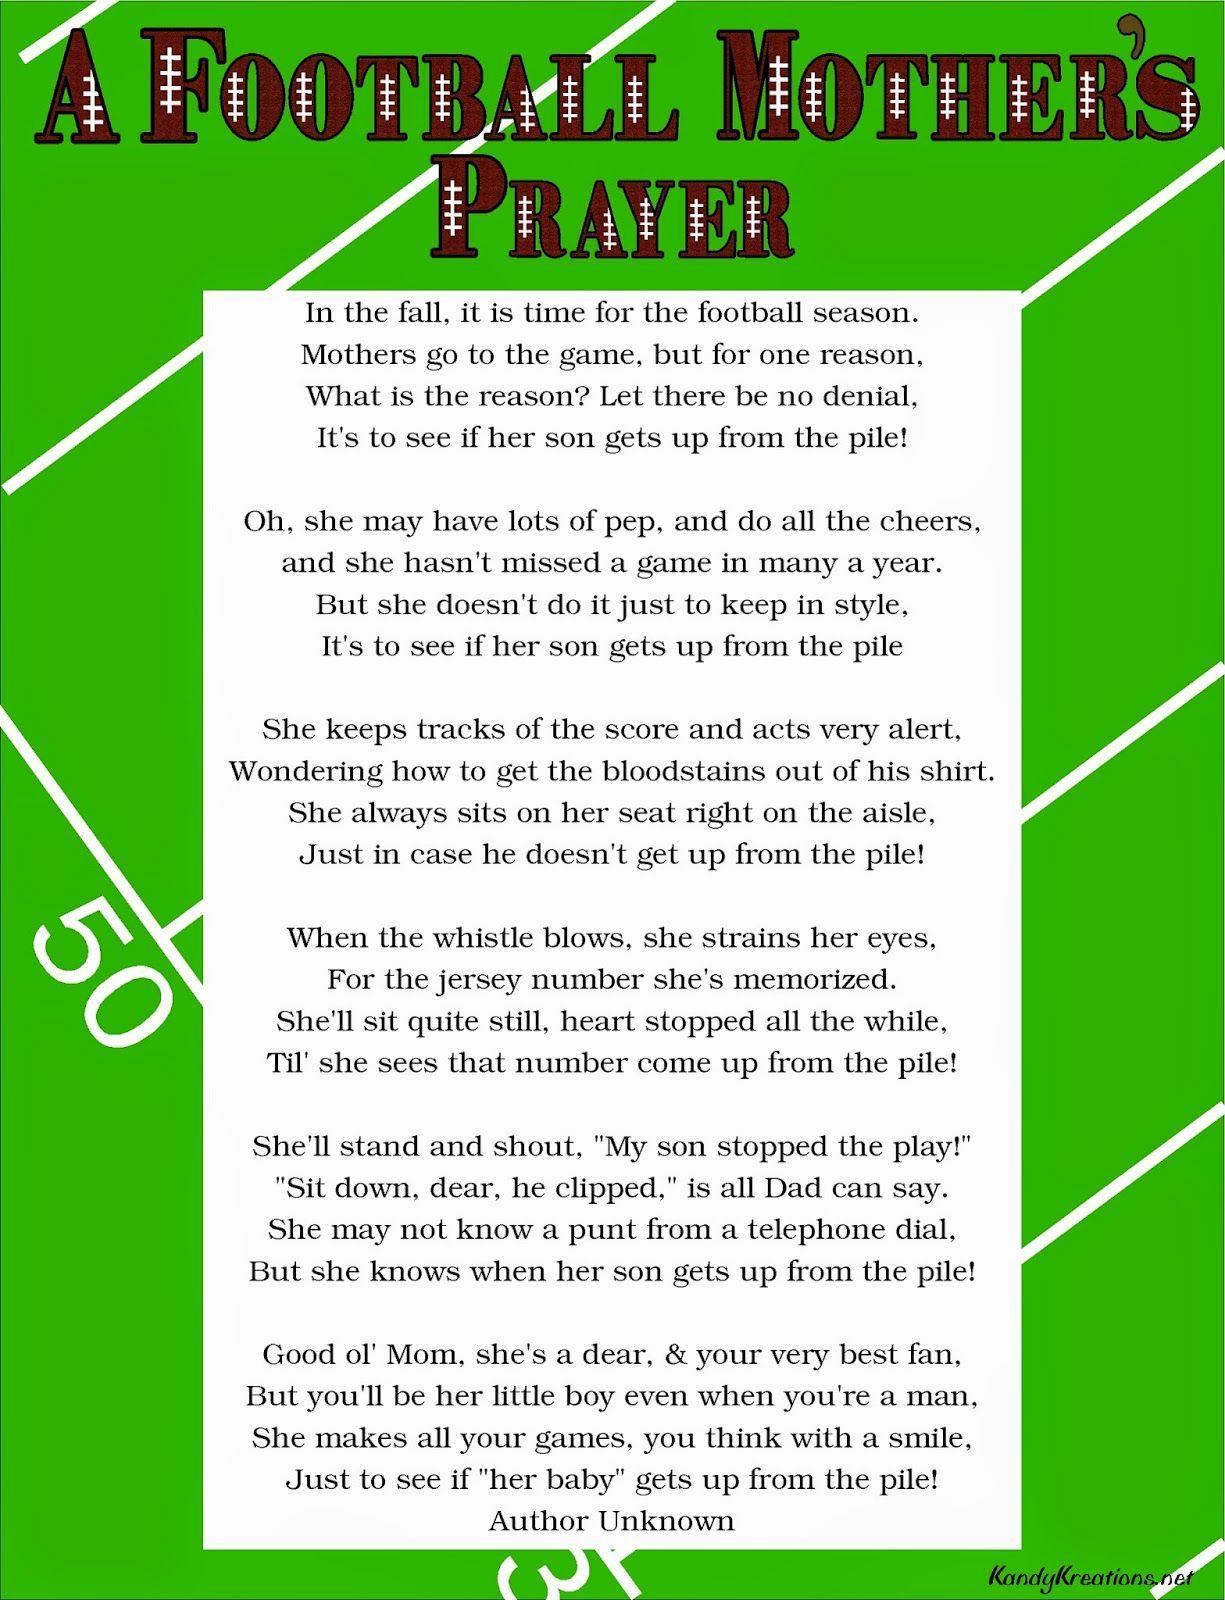 A football motherus prayer poem free printable